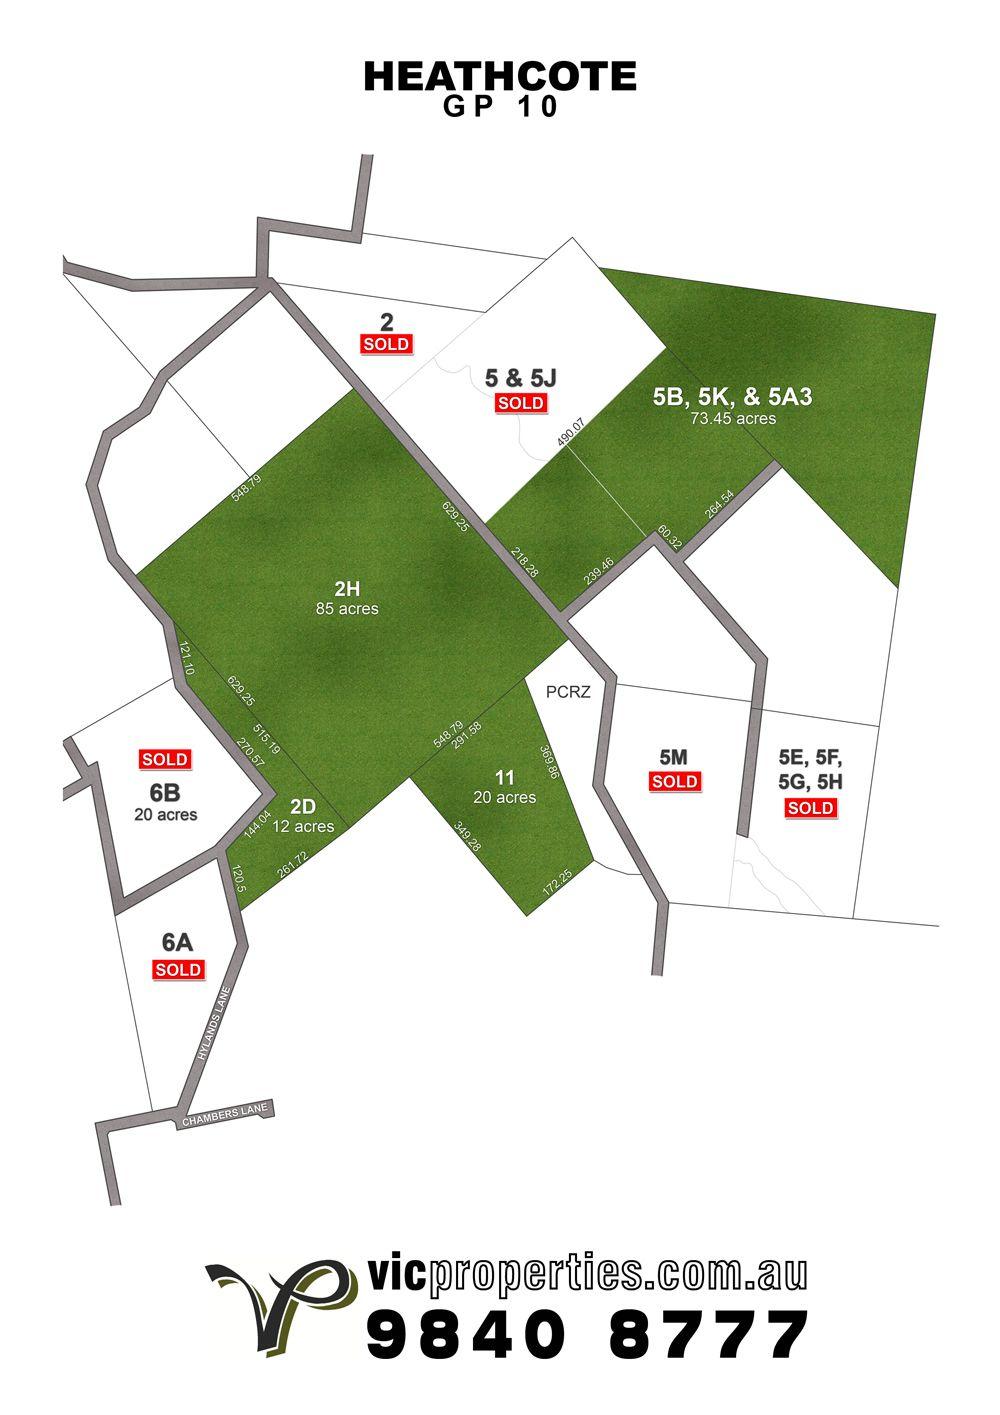 Lot 2D/ Hylands Lane, Heathcote VIC 3523